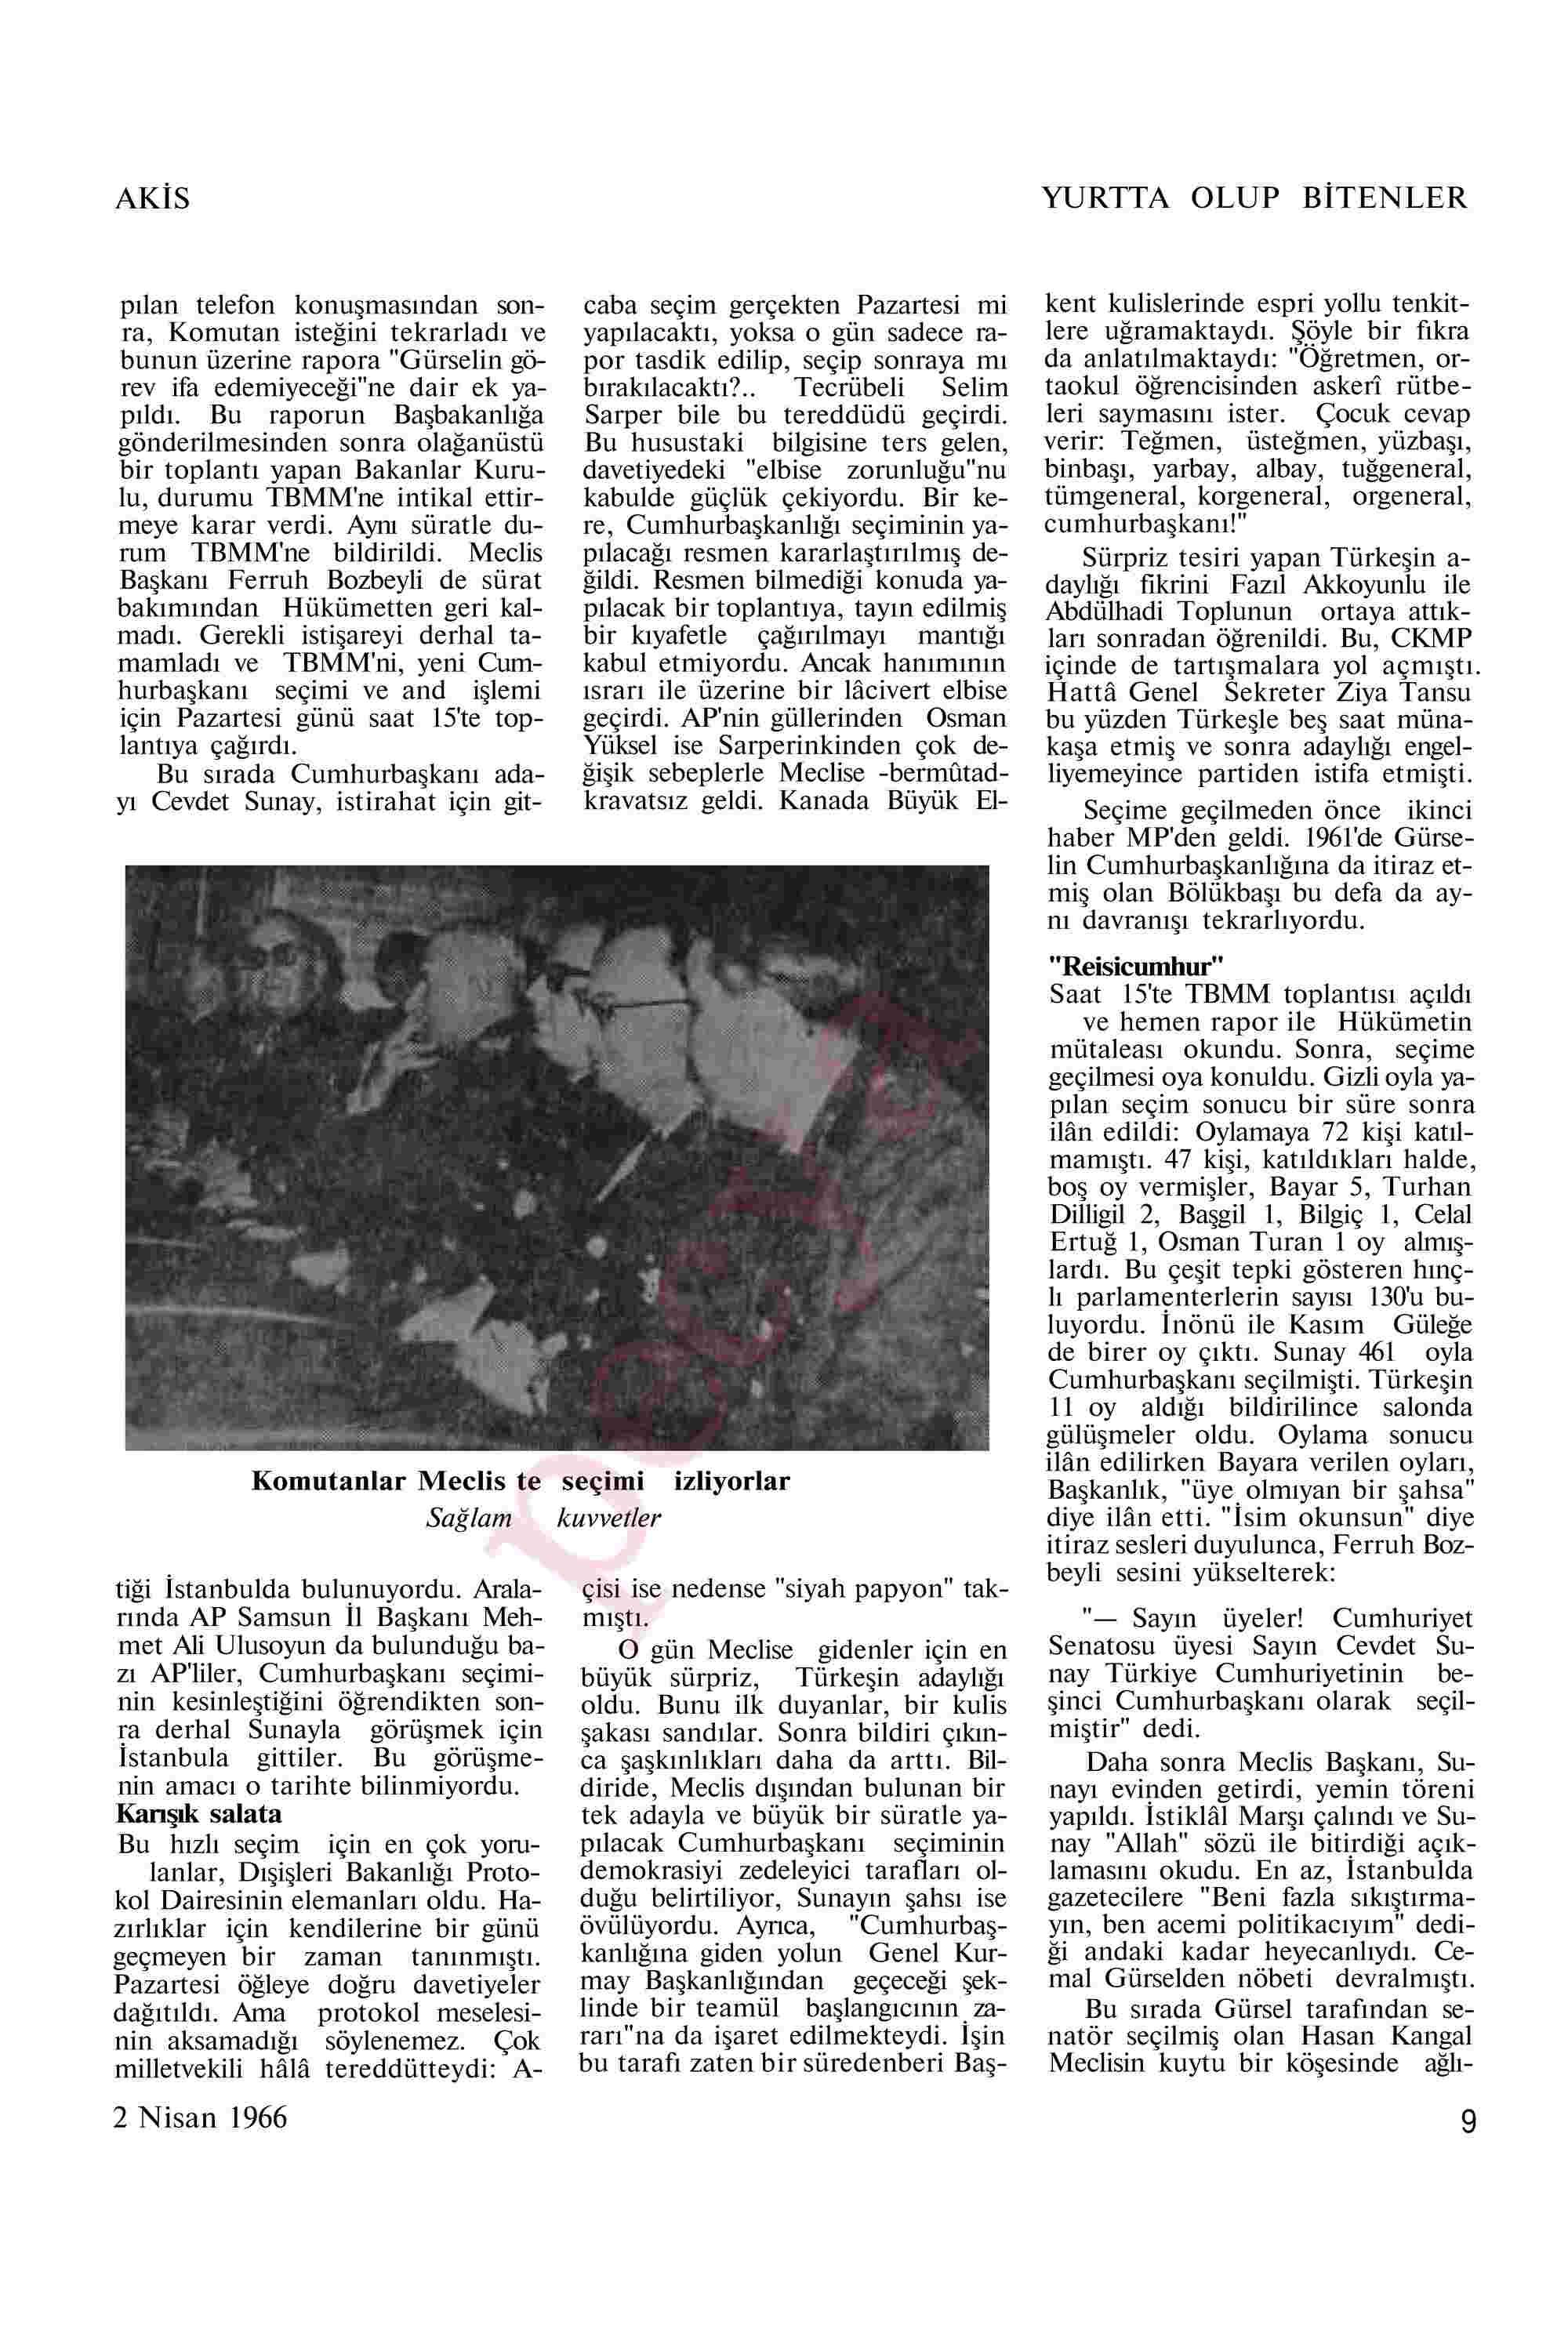 2 Nisan 1966 Tarihli Akis Dergisi Sayfa 9